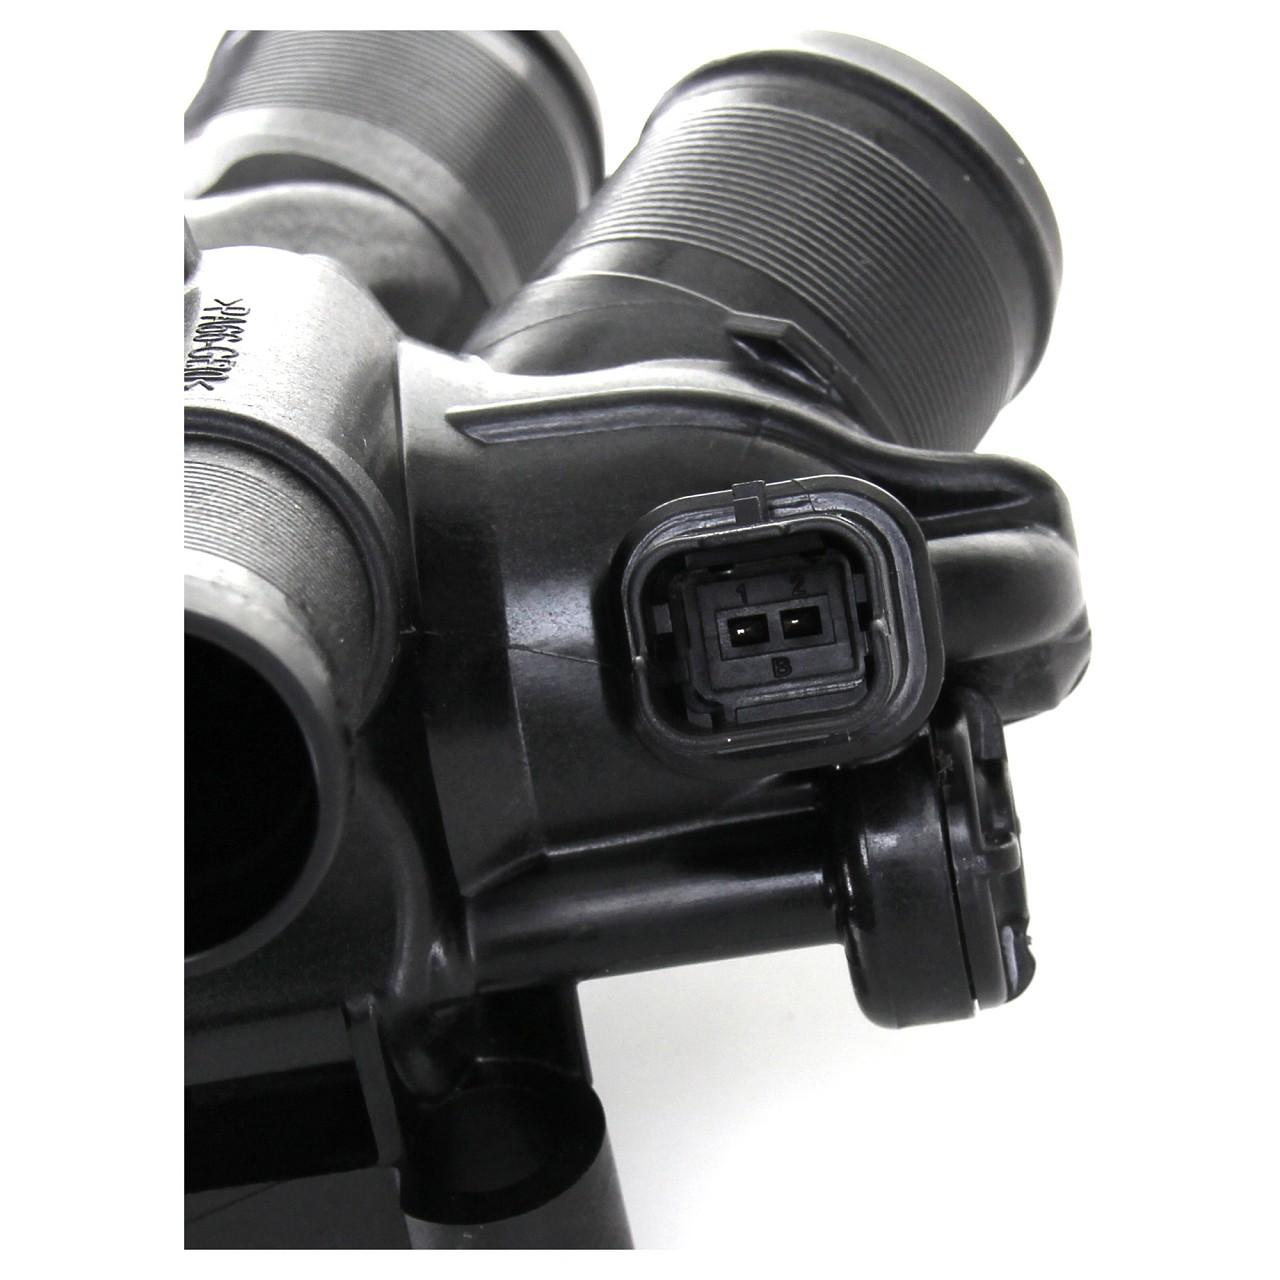 ORIGINAL PSA Thermostatgehäuse + Sensor + Dichtung 1.4 1.6 9808646980